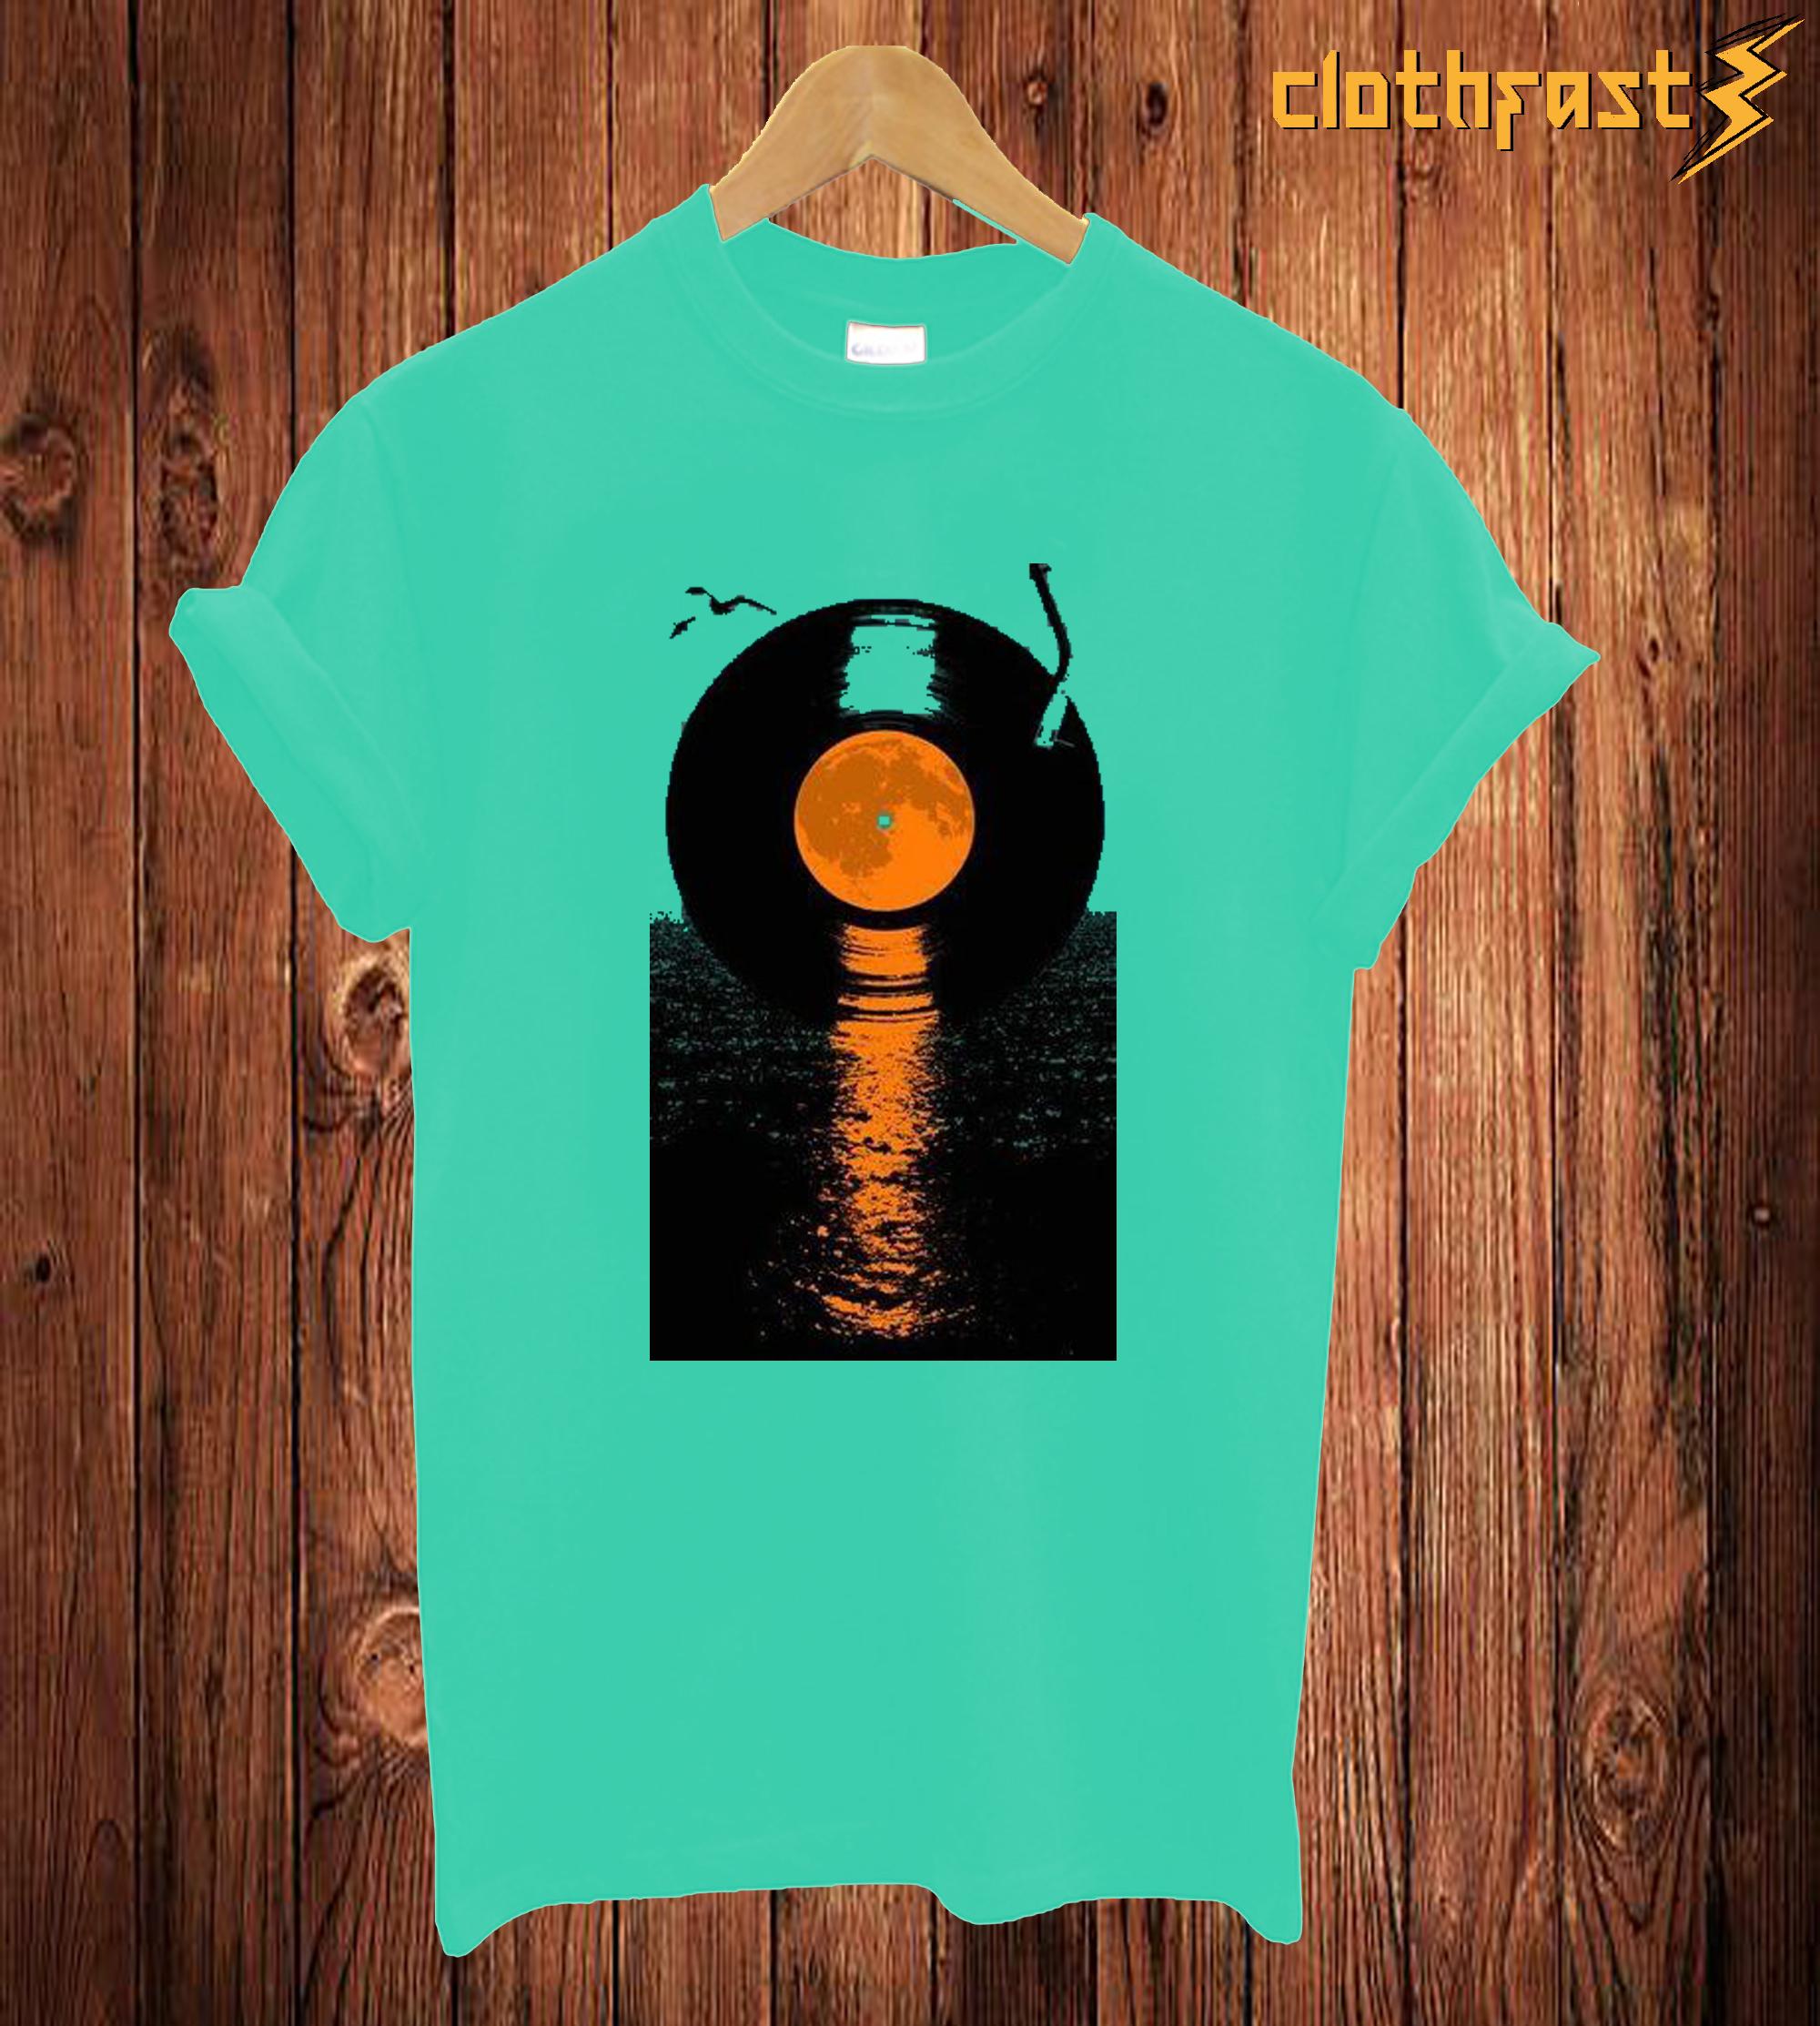 Vinyi Record T Shirt